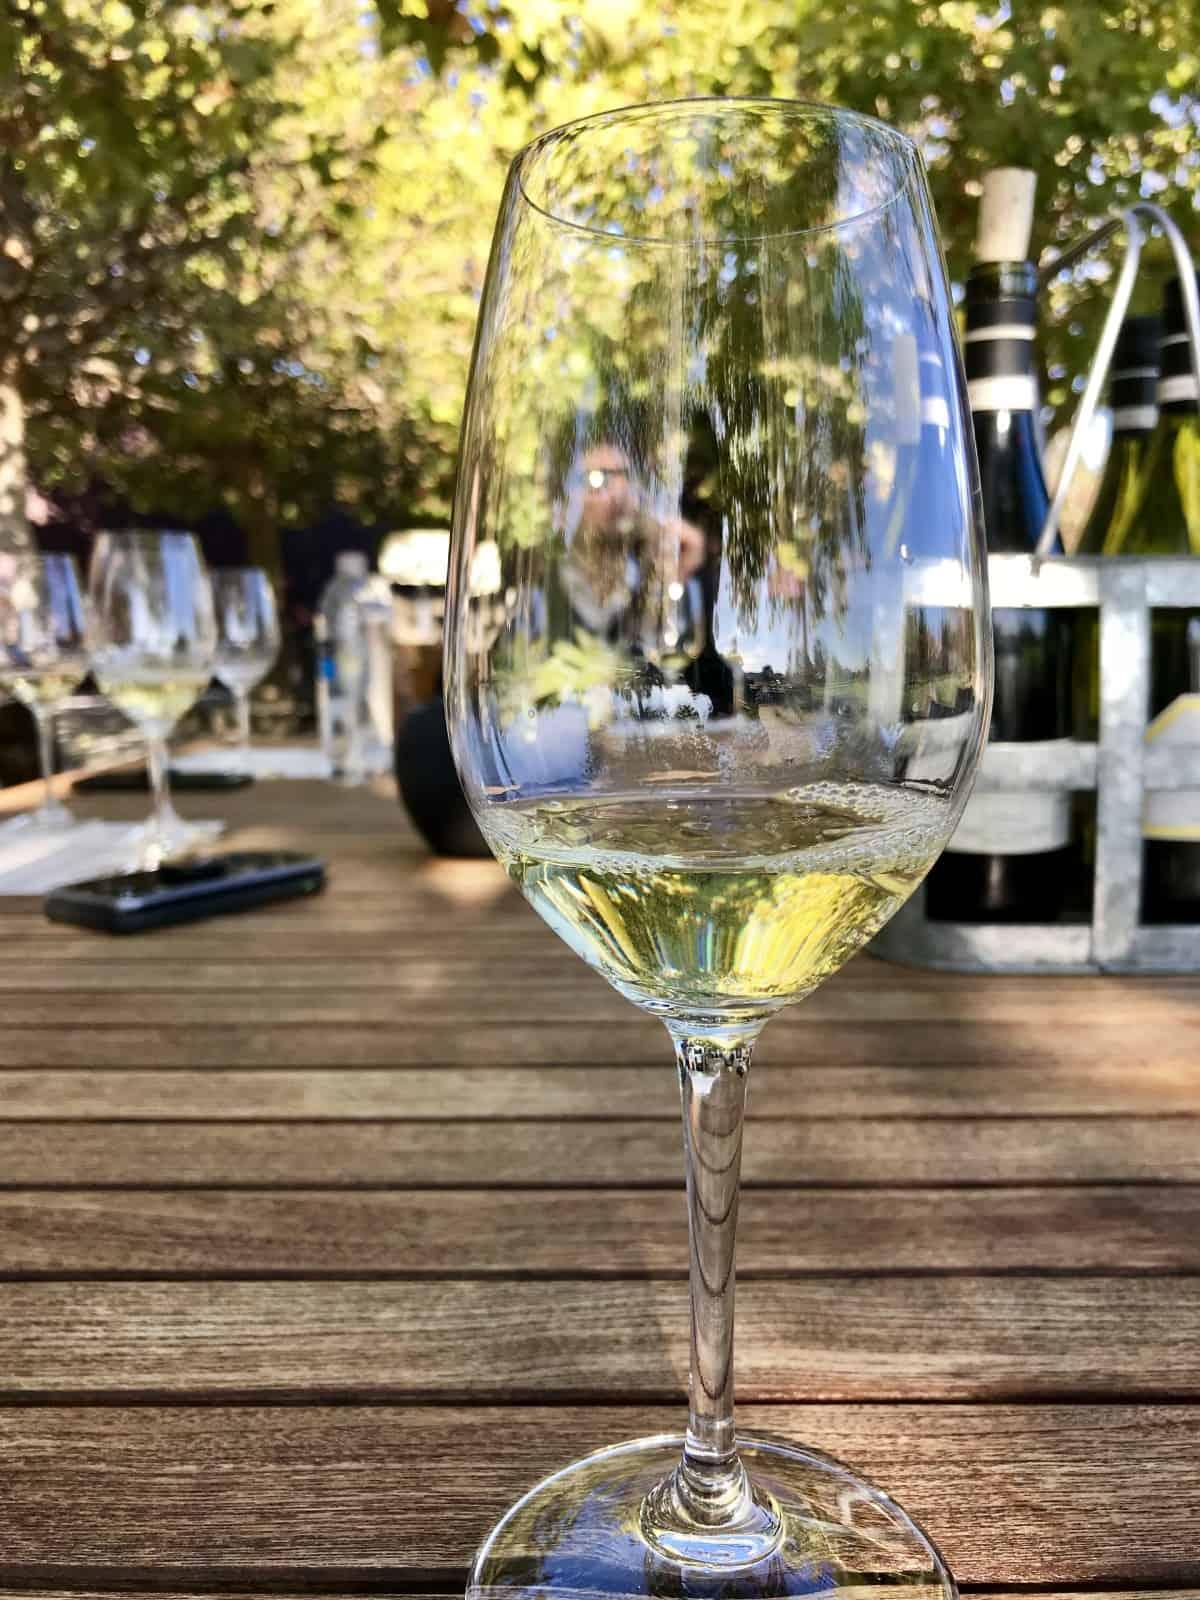 Tasting some of Sonoma-Cutrer's chardonnays